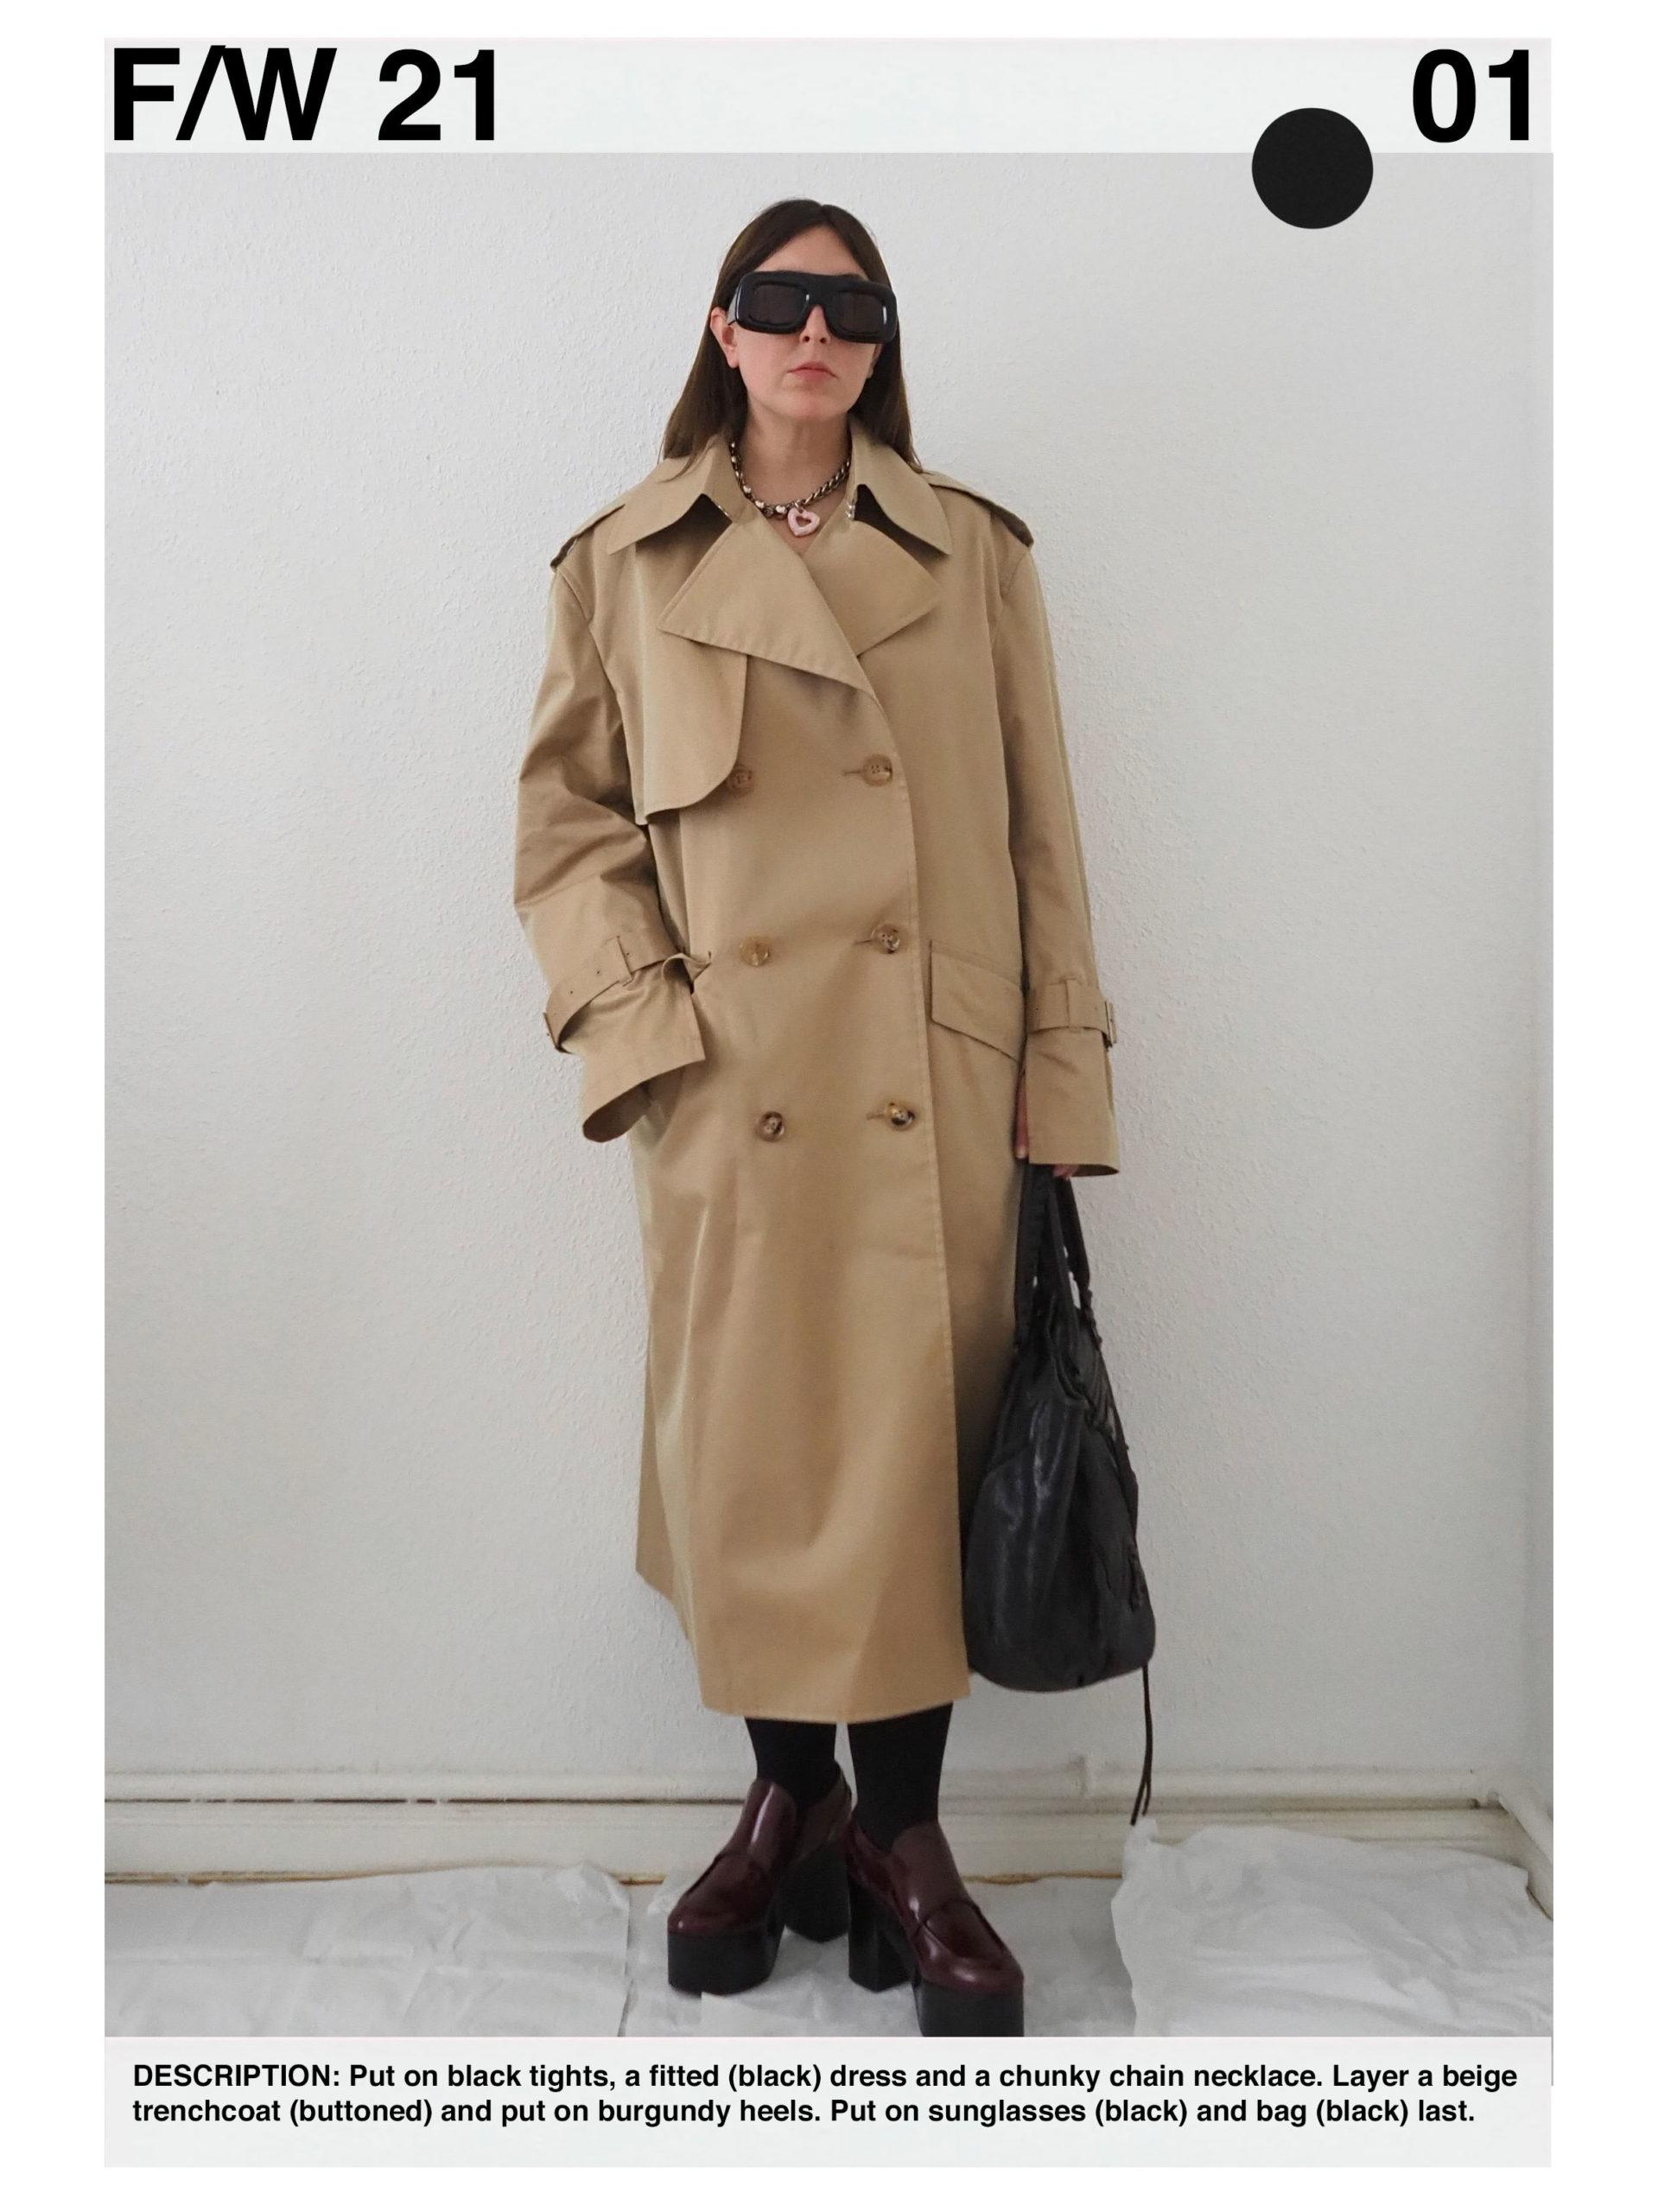 Outfit: Junya Watanabe beige trenchcoat, Dries van Noten platform loafers, Acne Studios black oversized sunglasses, Acne Studios chunky chain necklace, Vintage black Balenciaga City bag